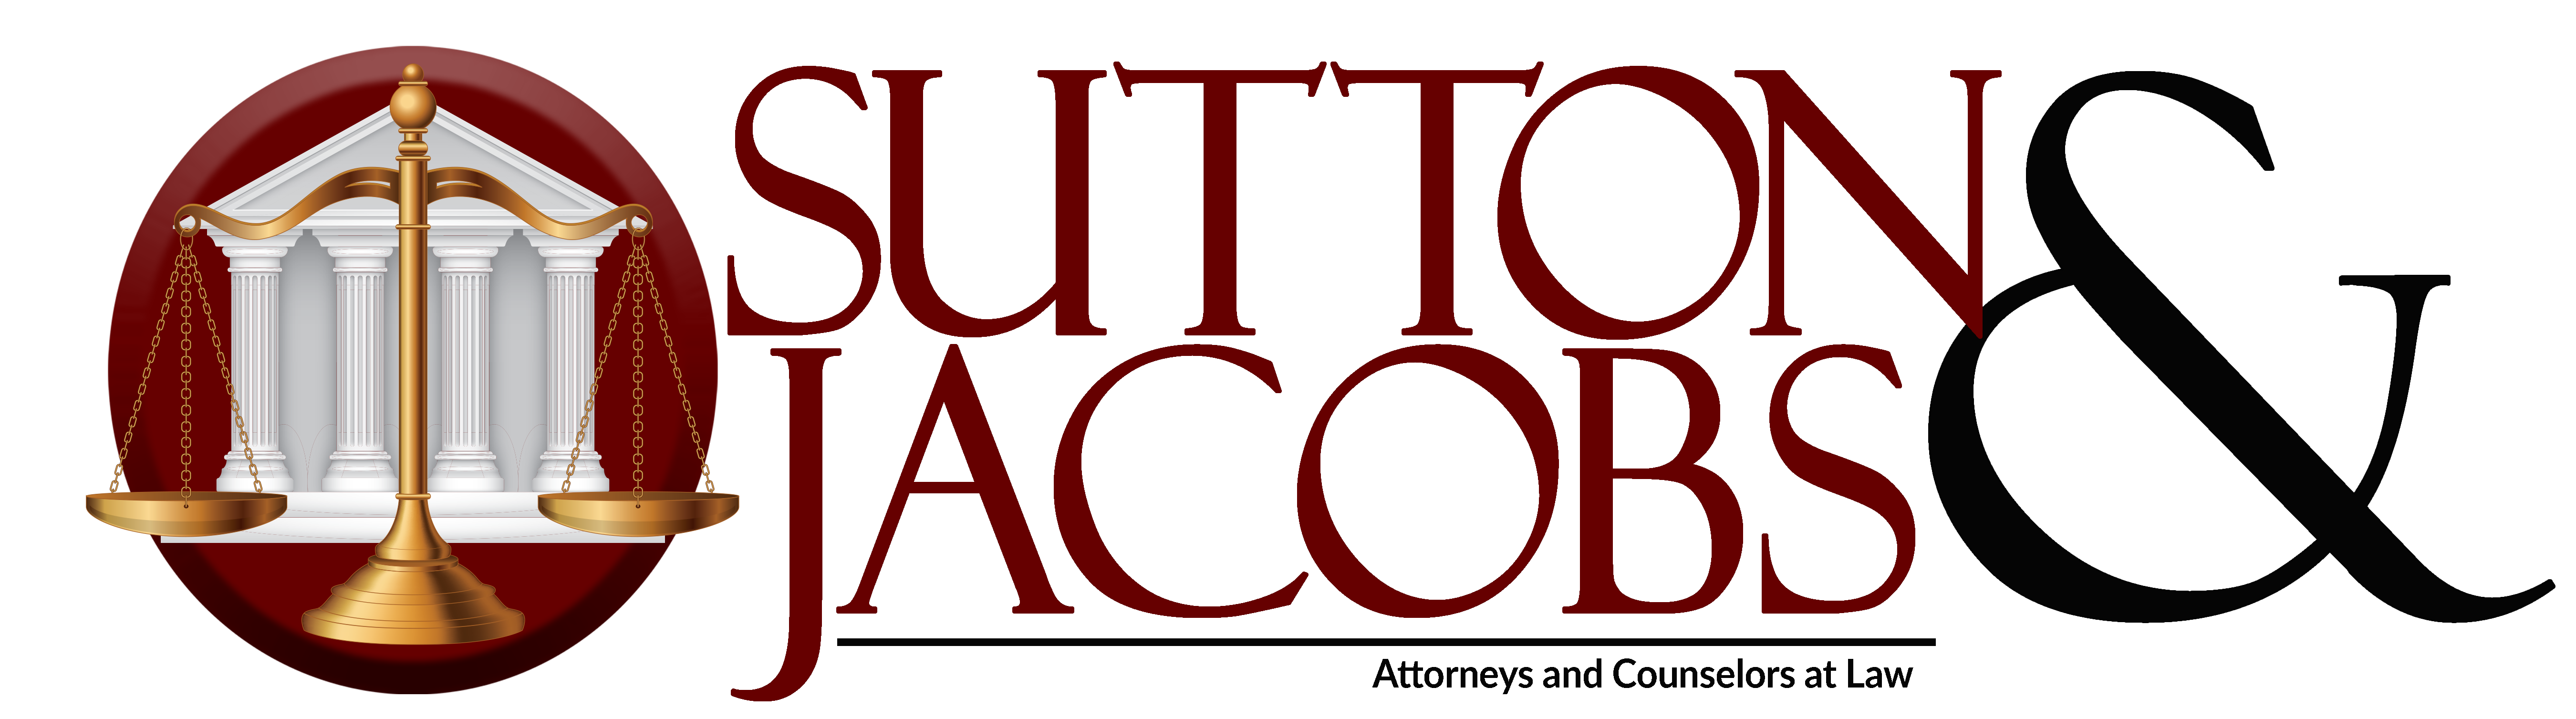 Sutton & Jacobs LLP